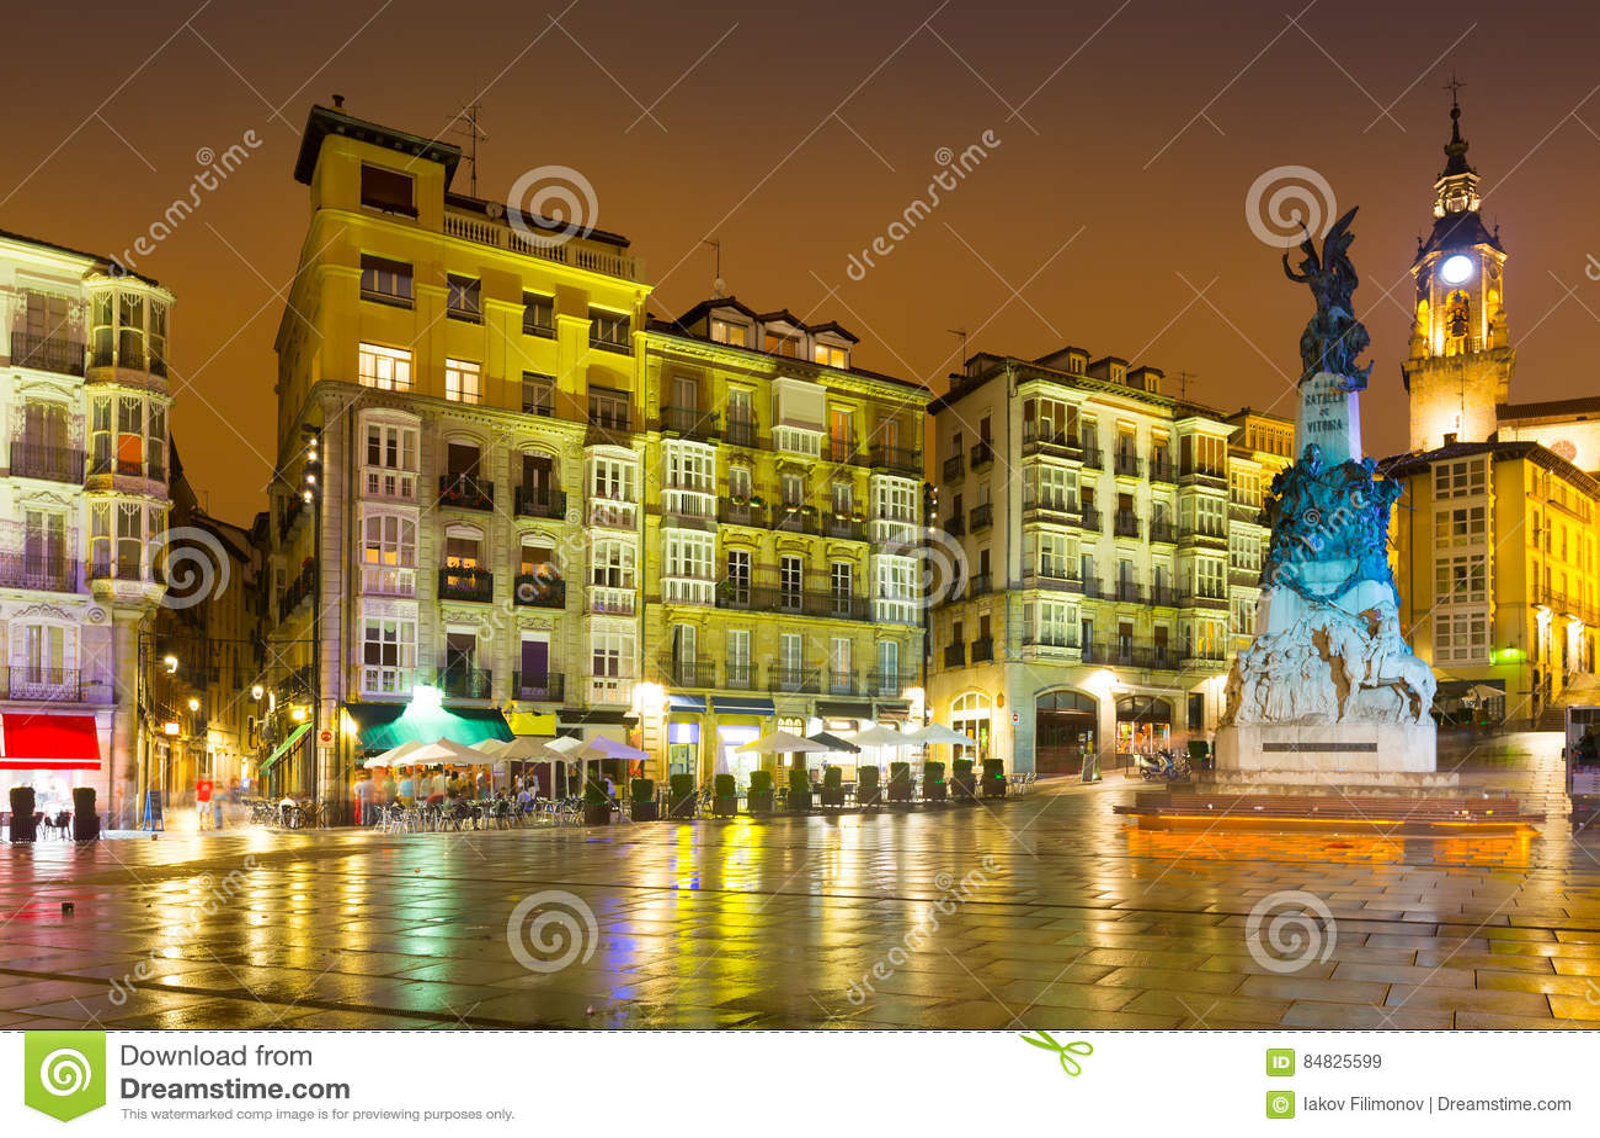 Virgen Blanca Square in avondtijd Vitoria-Gasteiz